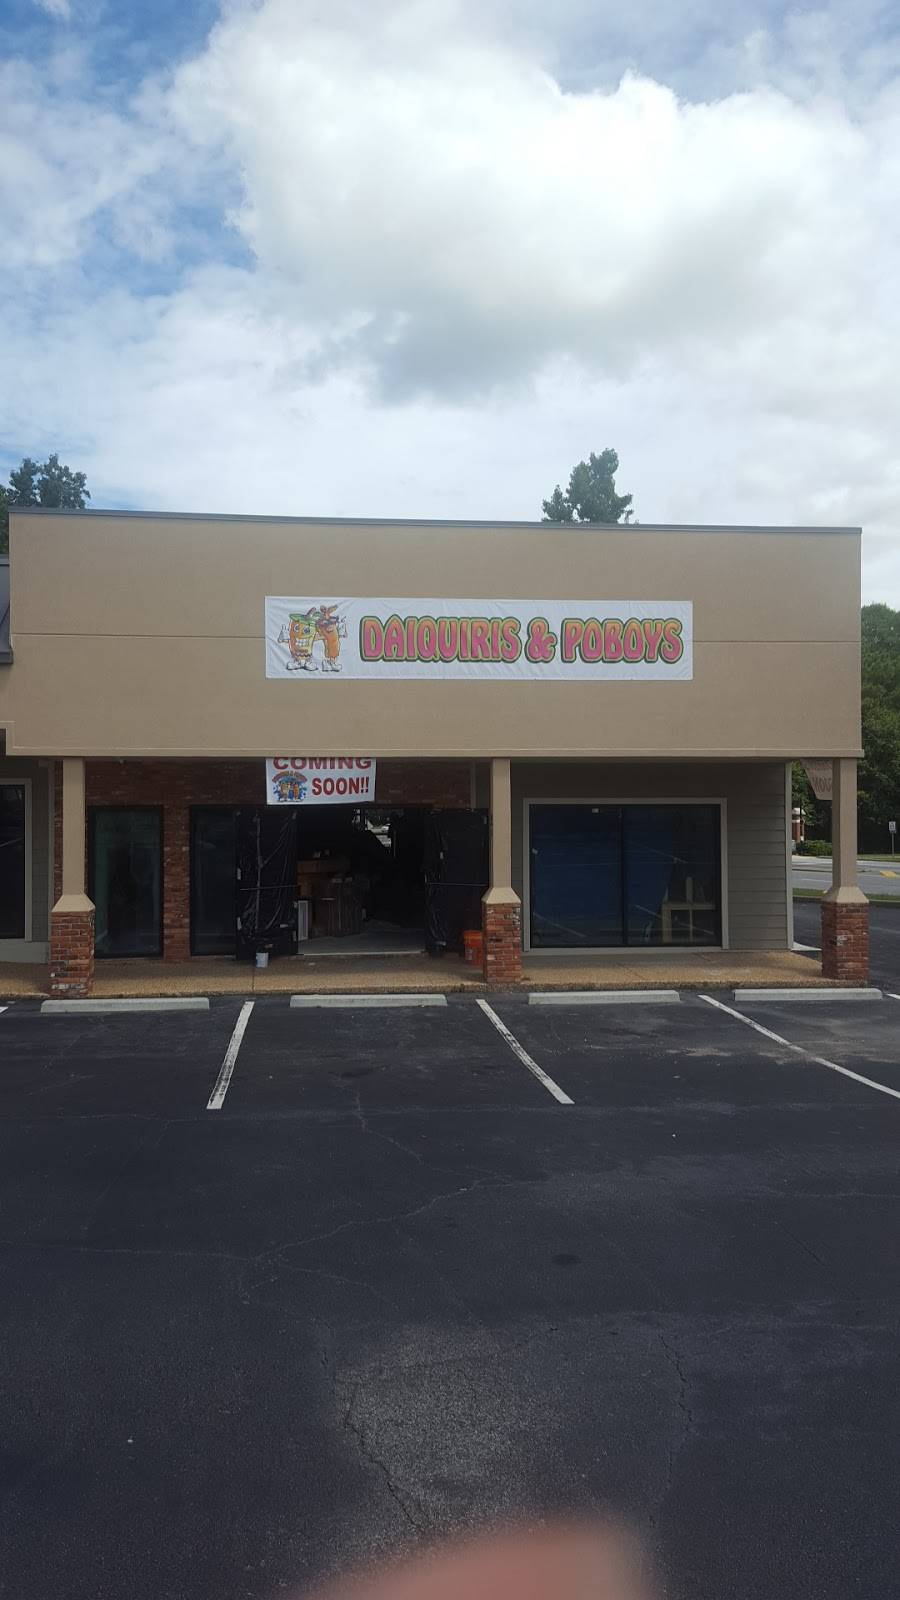 daiquiris & poboys | restaurant | 3709 Gentian Blvd, Columbus, GA 31907, USA